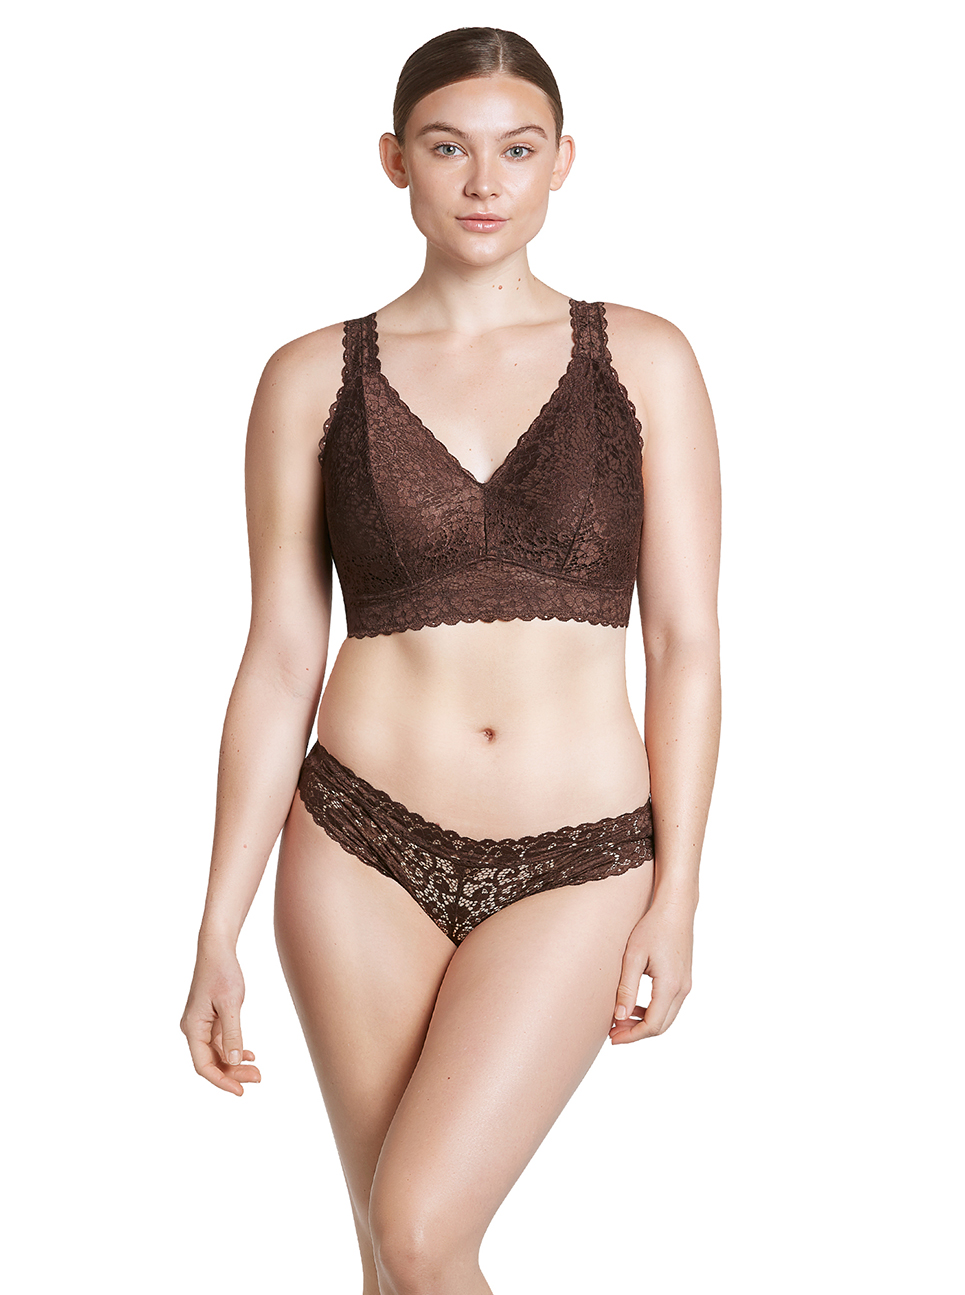 PARFAIT Adriana LaceBralette P5482 Bikini P5483 IntenseBrown Front - Adriana Lace Bralette Deep Nude P5482